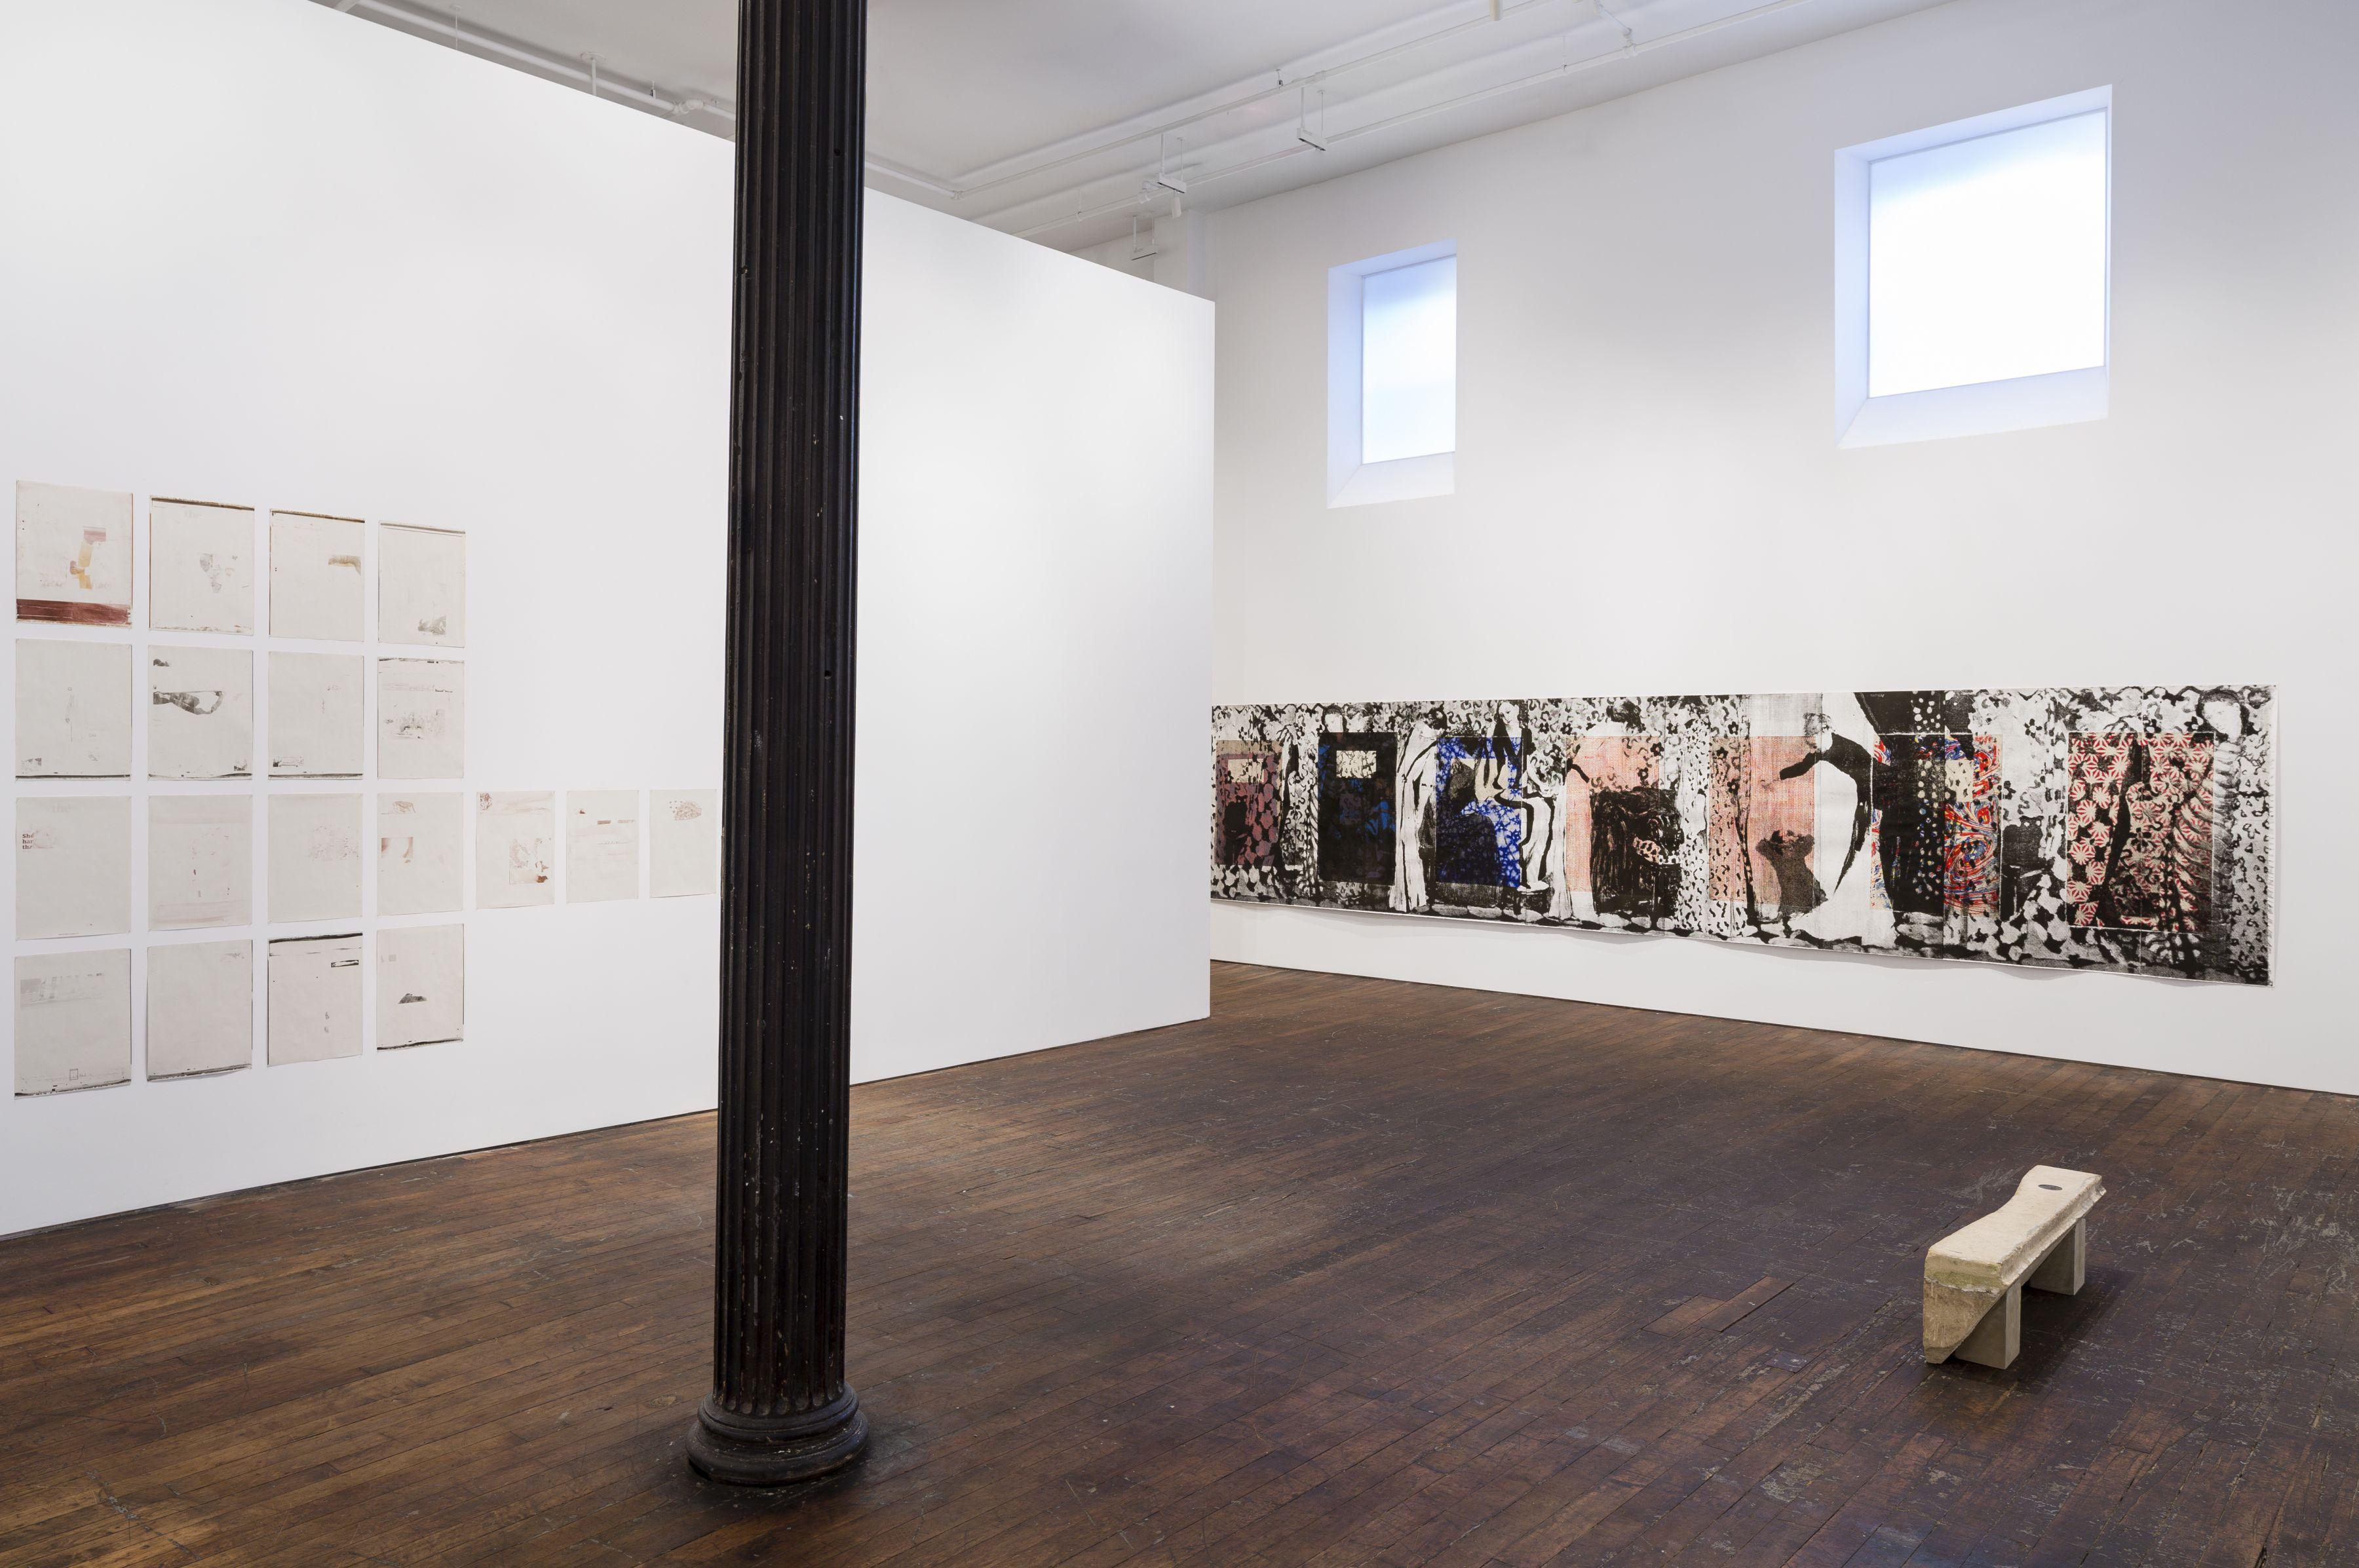 Lucy Skaer: Random House– installation view 4